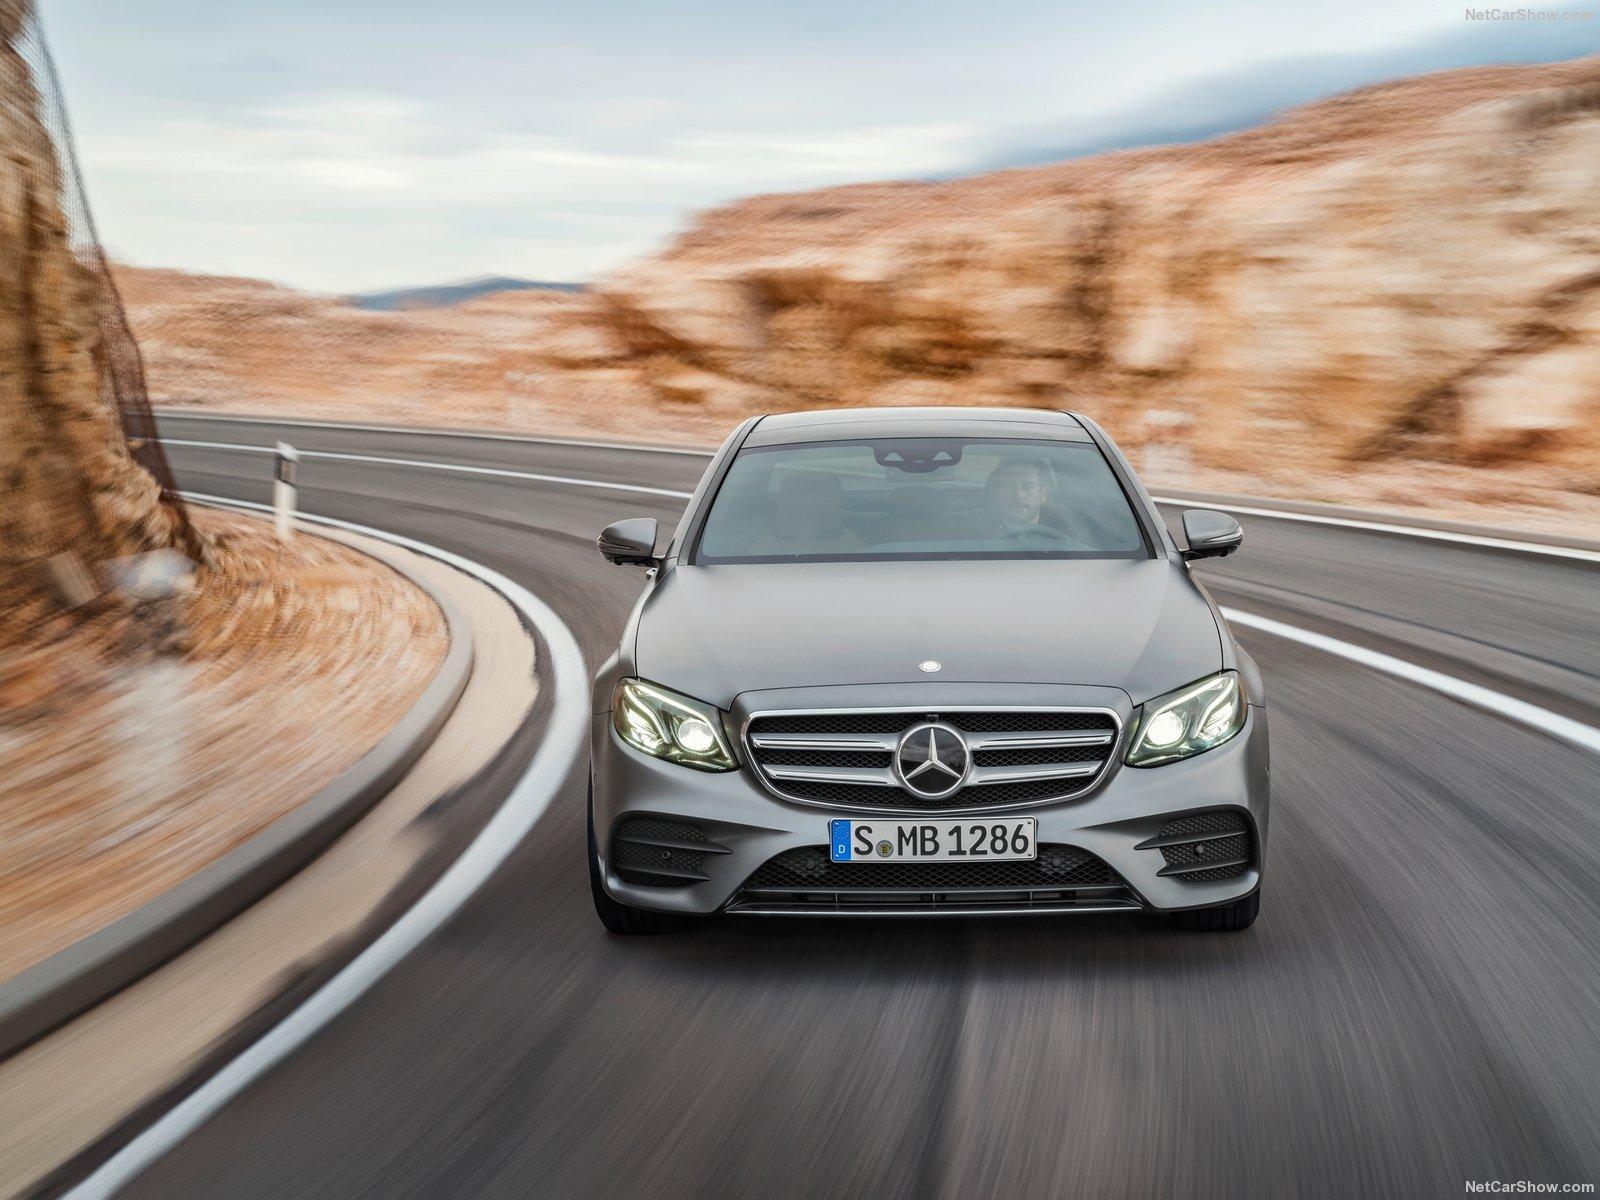 Mercedes-Benz E-Class 2020 Новый кузов. Фото, цены, характеристики